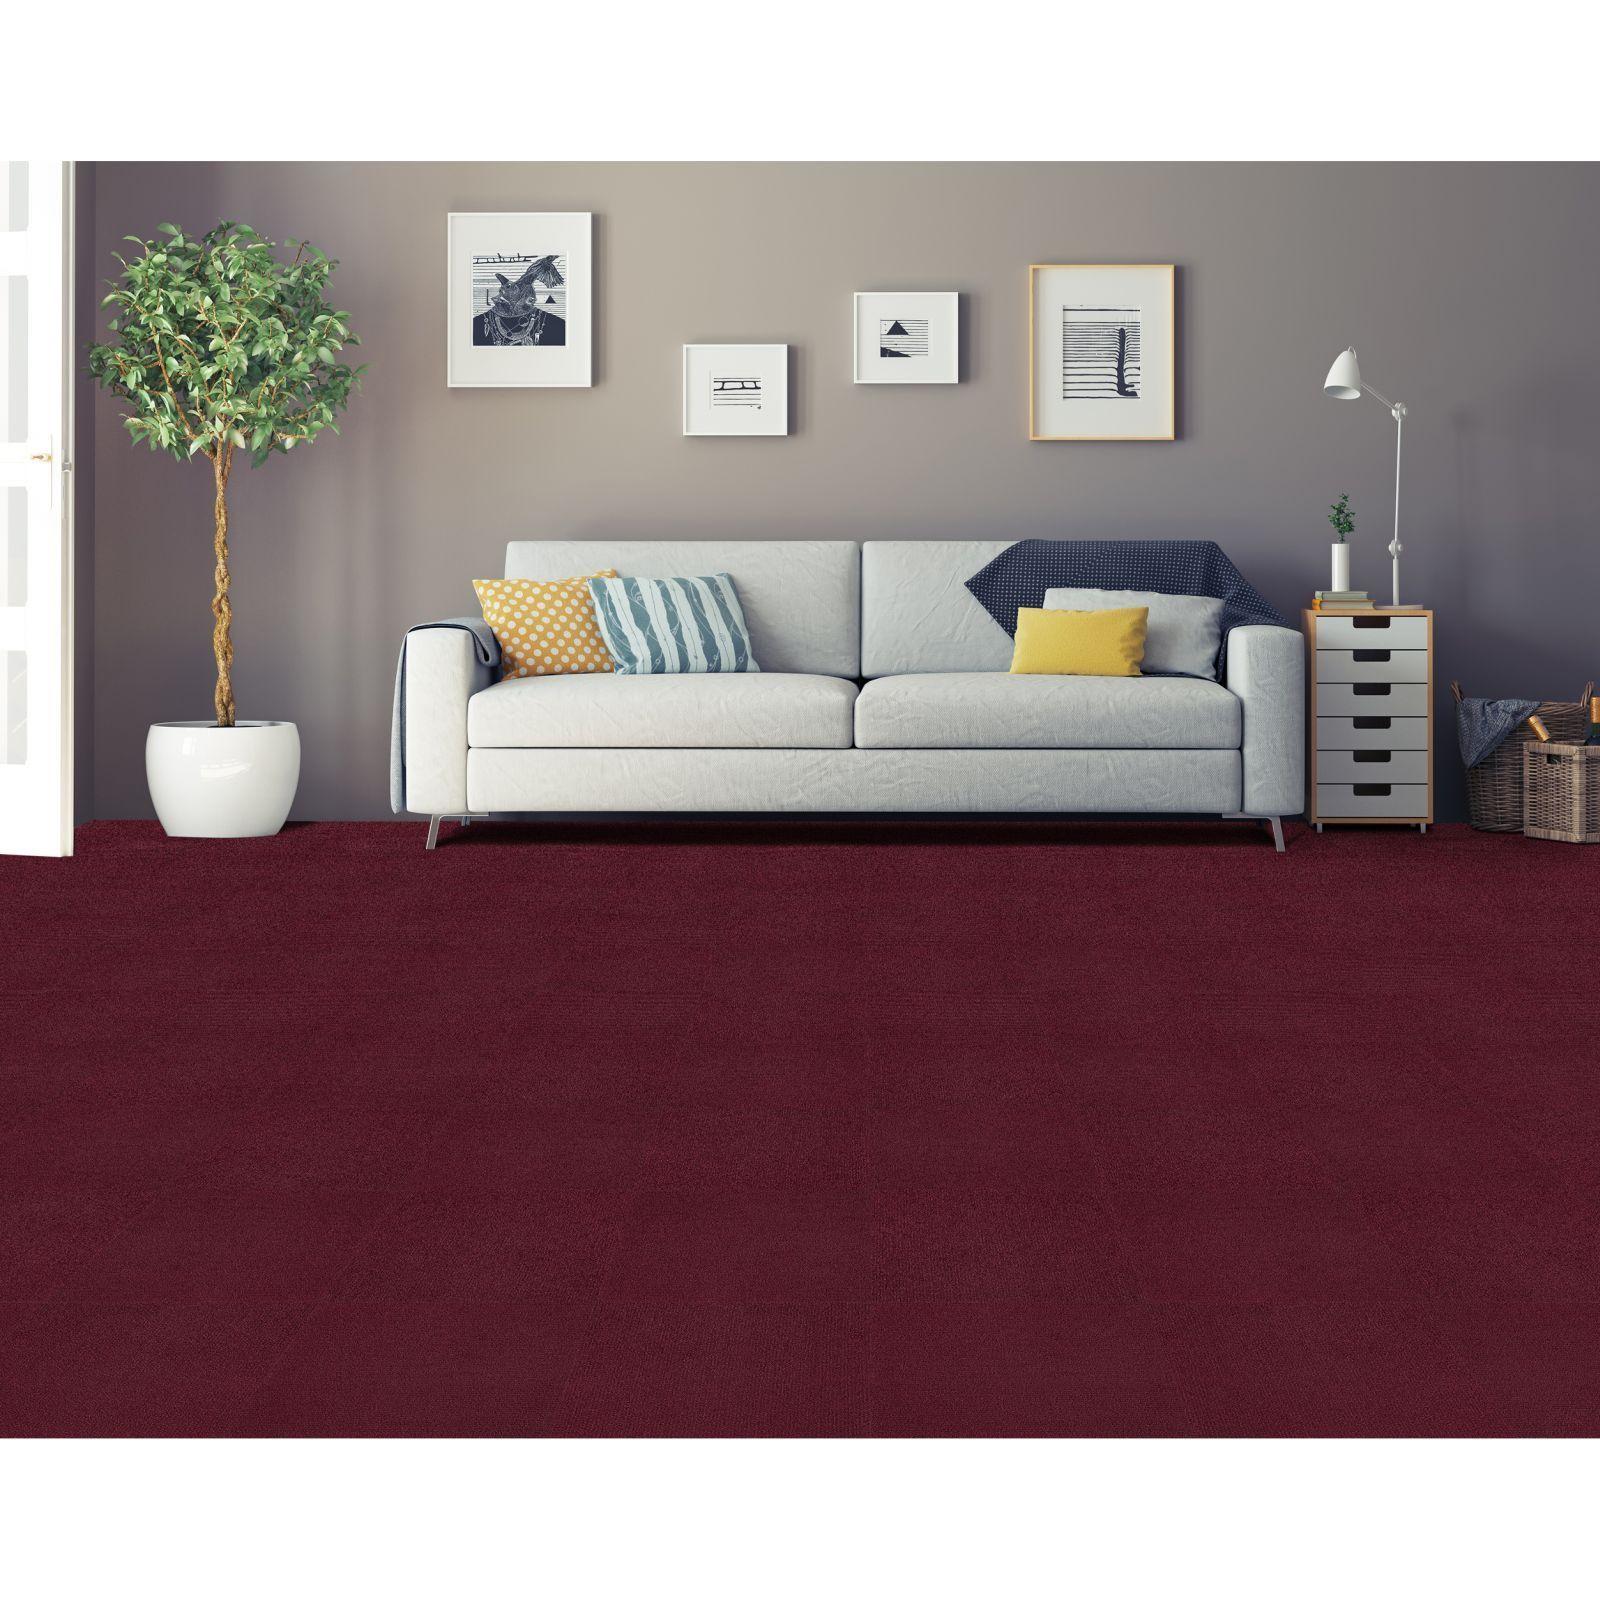 achim nexus burgundy self adhesive carpet floor tile 12 tiles